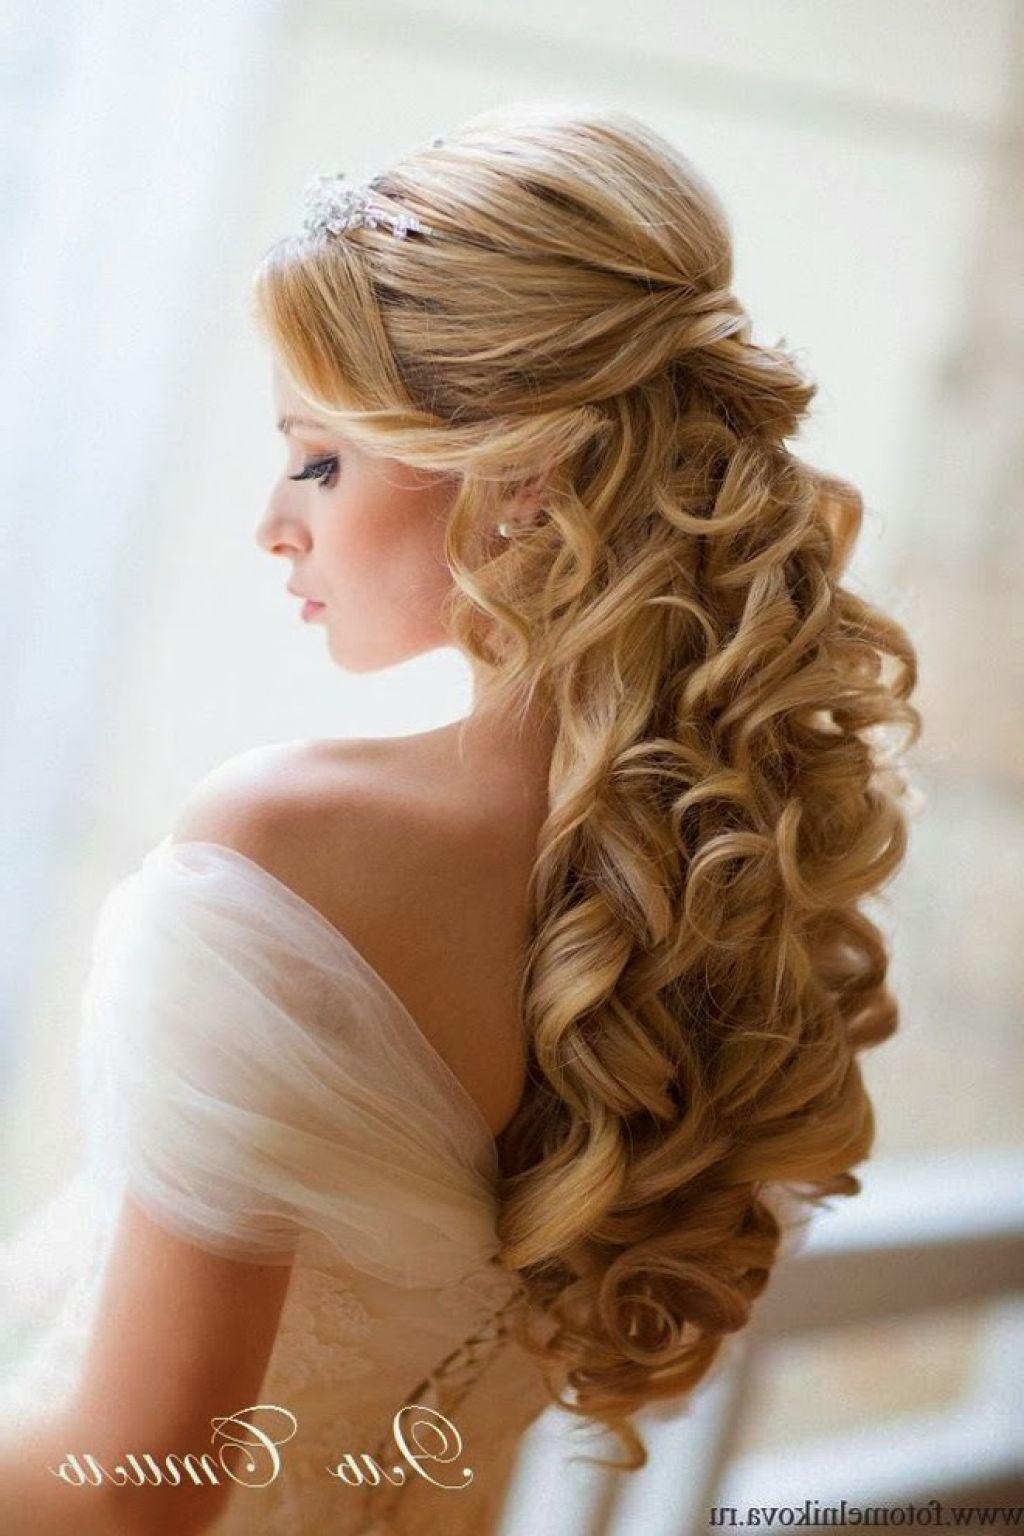 pin by lauren harvey on wedding in memory of | pinterest | hair